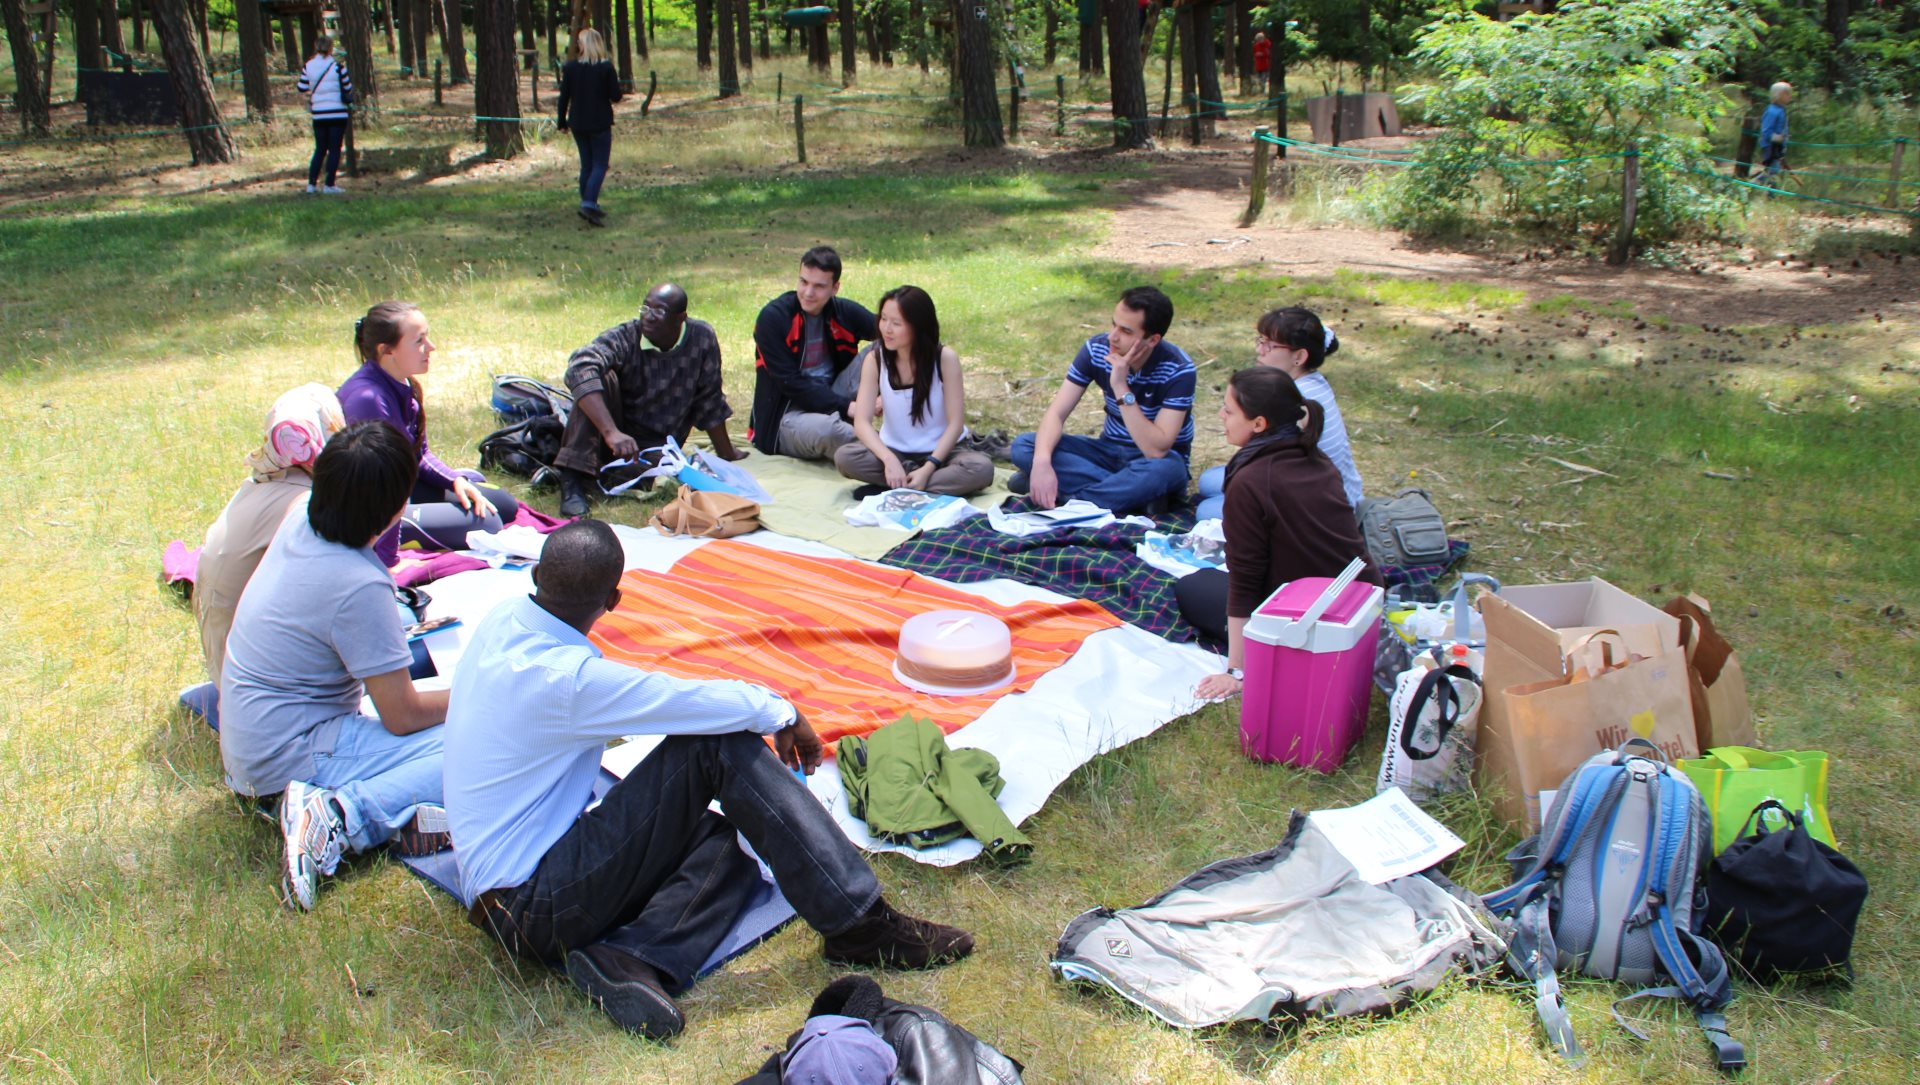 Picknick im Kletterwald